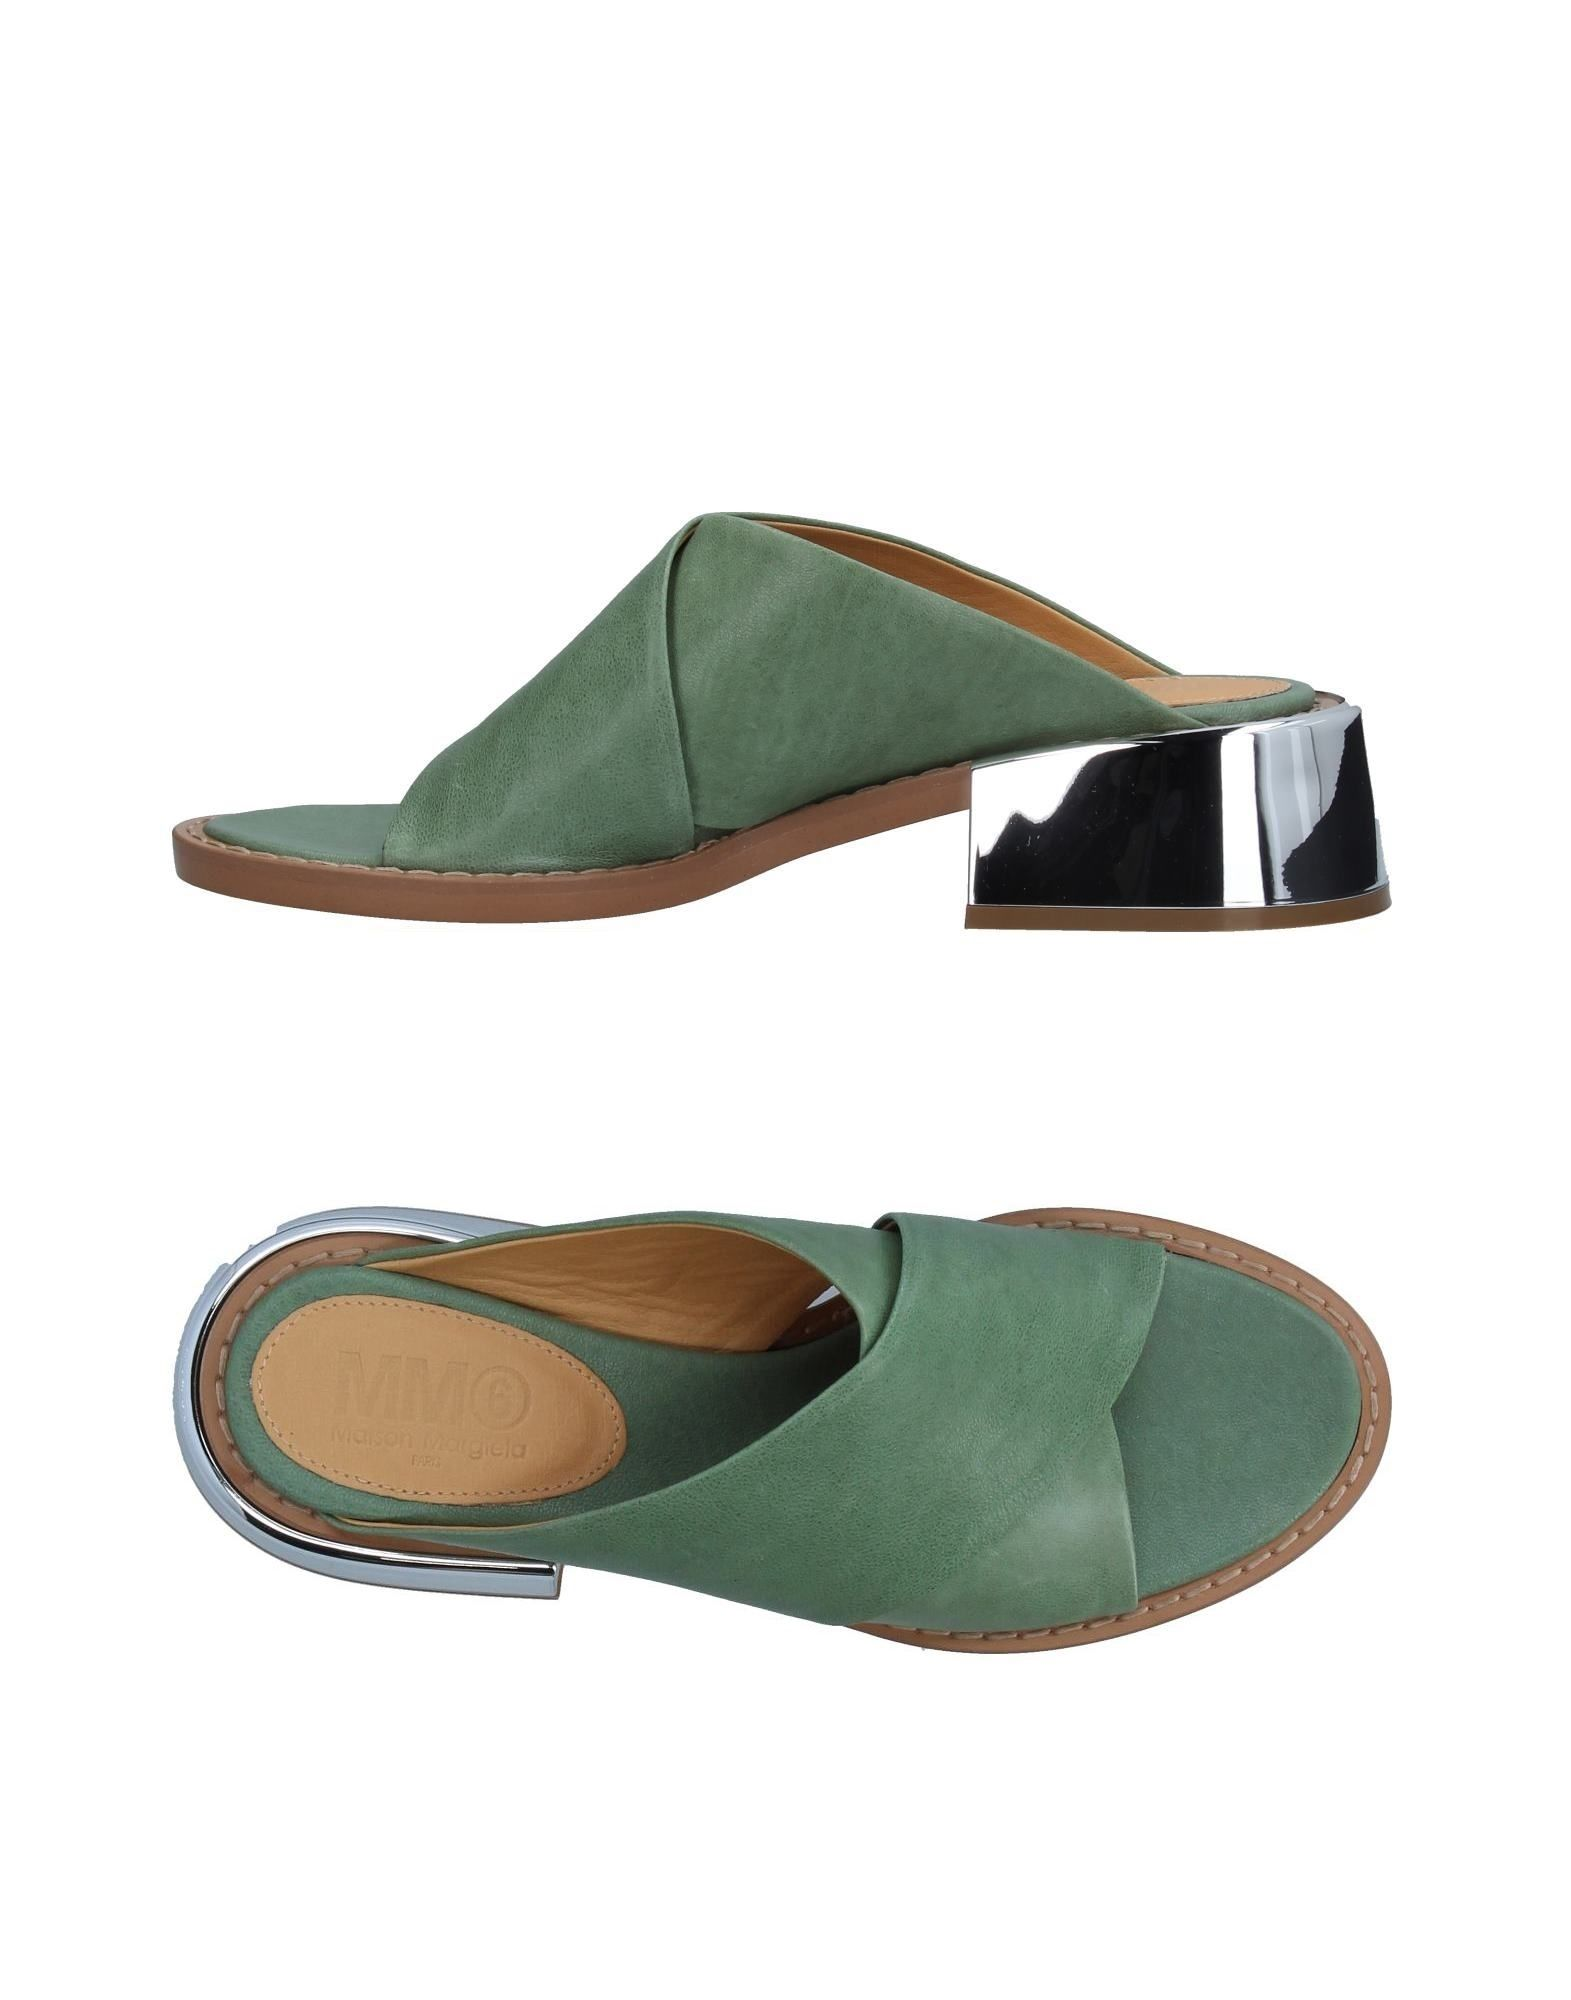 Mm6 Maison Margiela Sandalen Damen  11330125NJGut aussehende strapazierfähige Schuhe